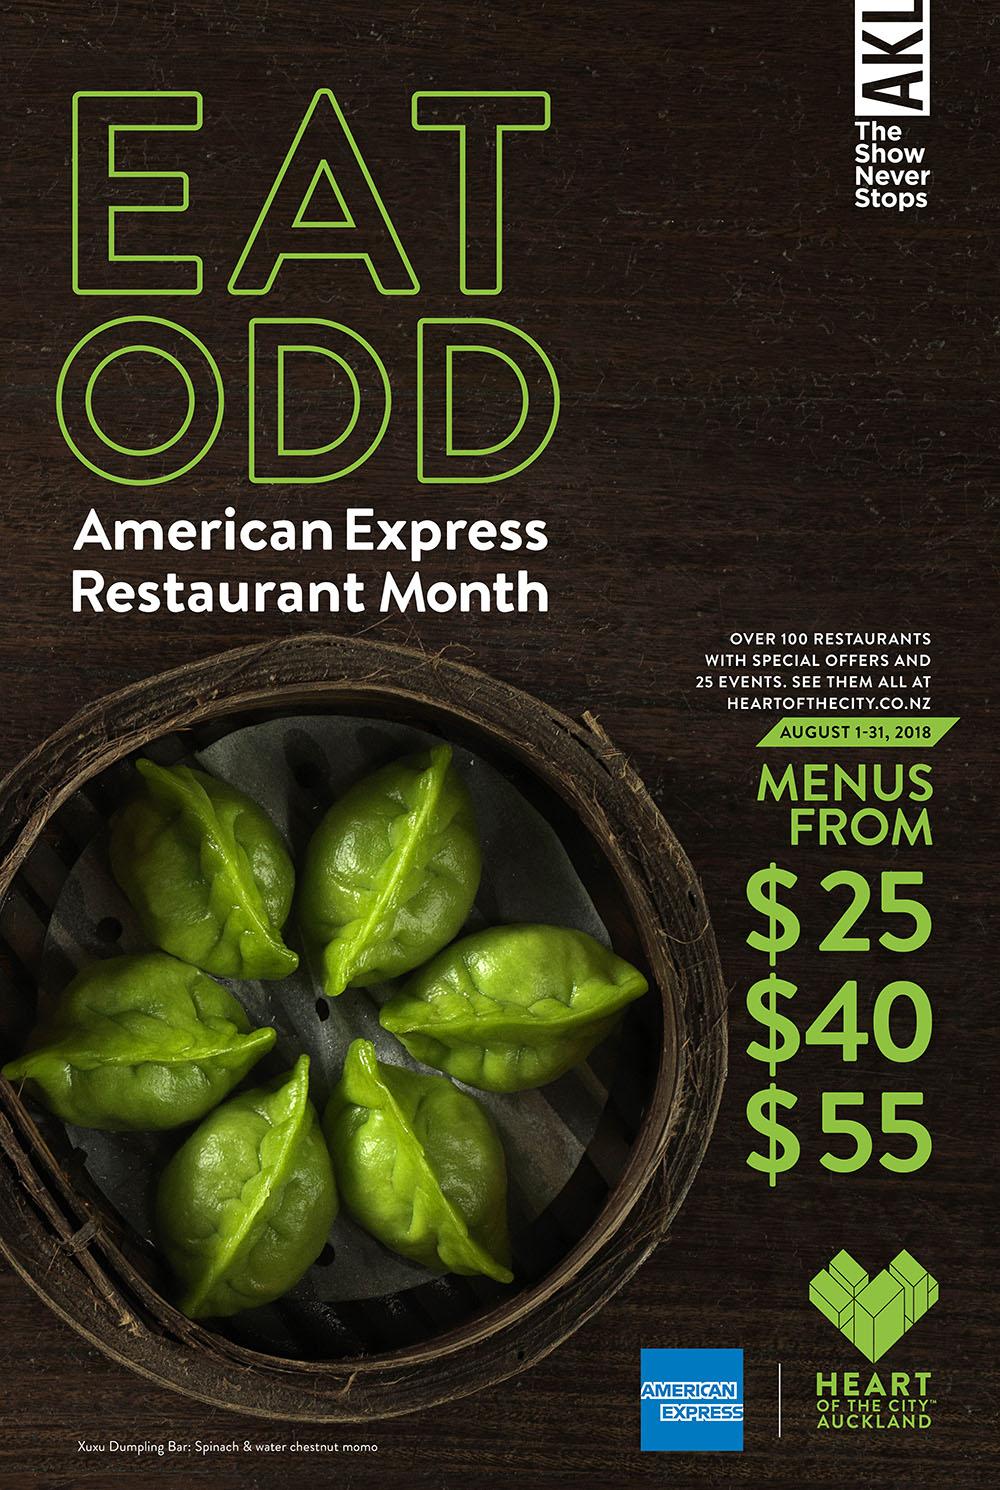 HOC1582_Restaurant Month_2018_OOH_Adshel_metrolite_XUXU.jpg